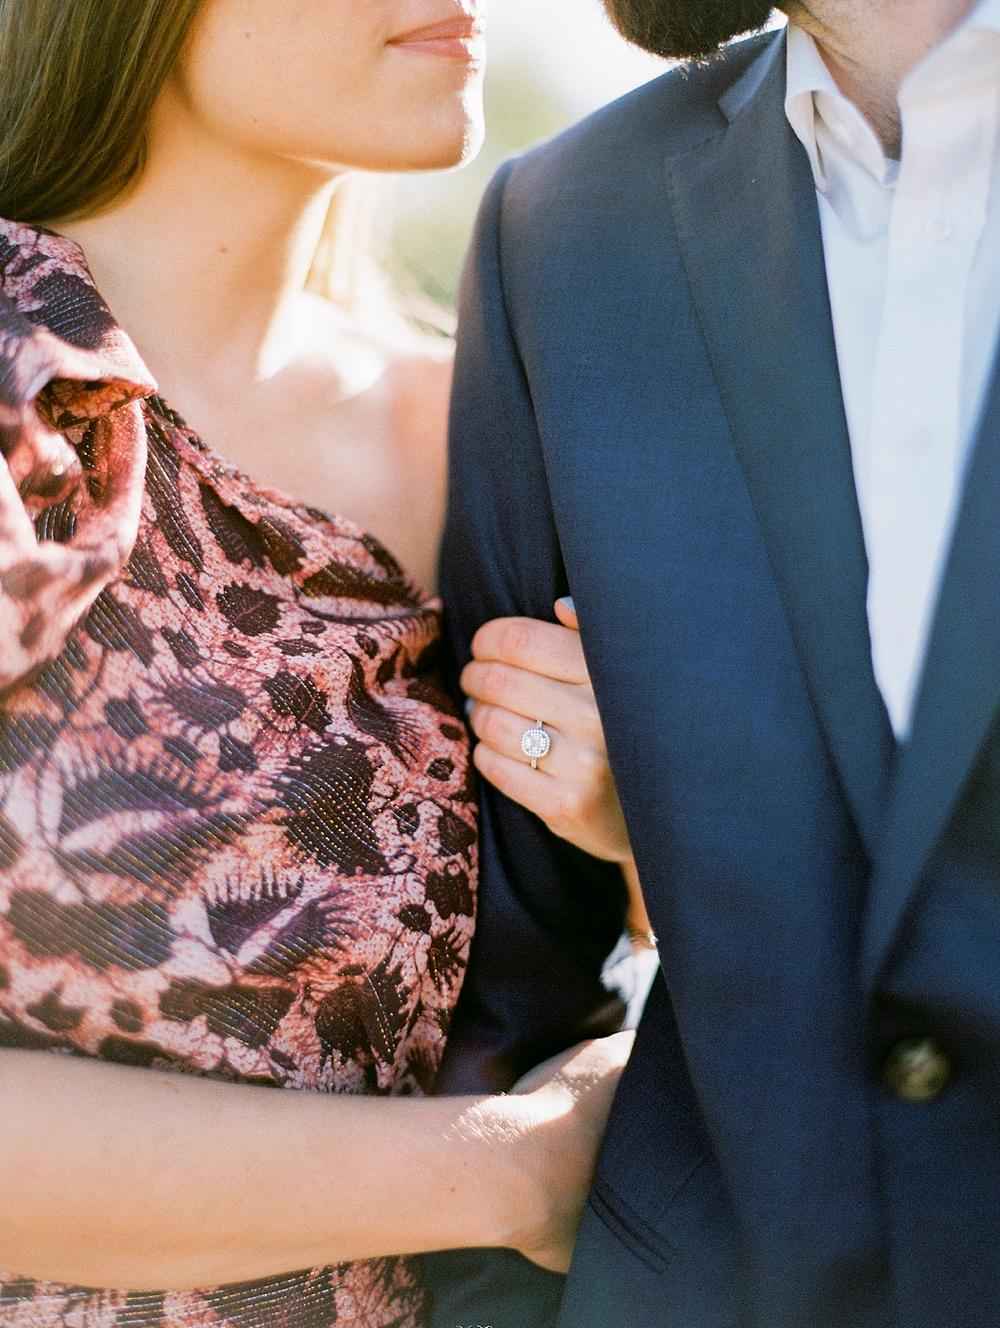 kristin-la-voie-photography-Austin-Wedding-Photographer-laguna-gloria-commodore-perry-estate-engagement-202